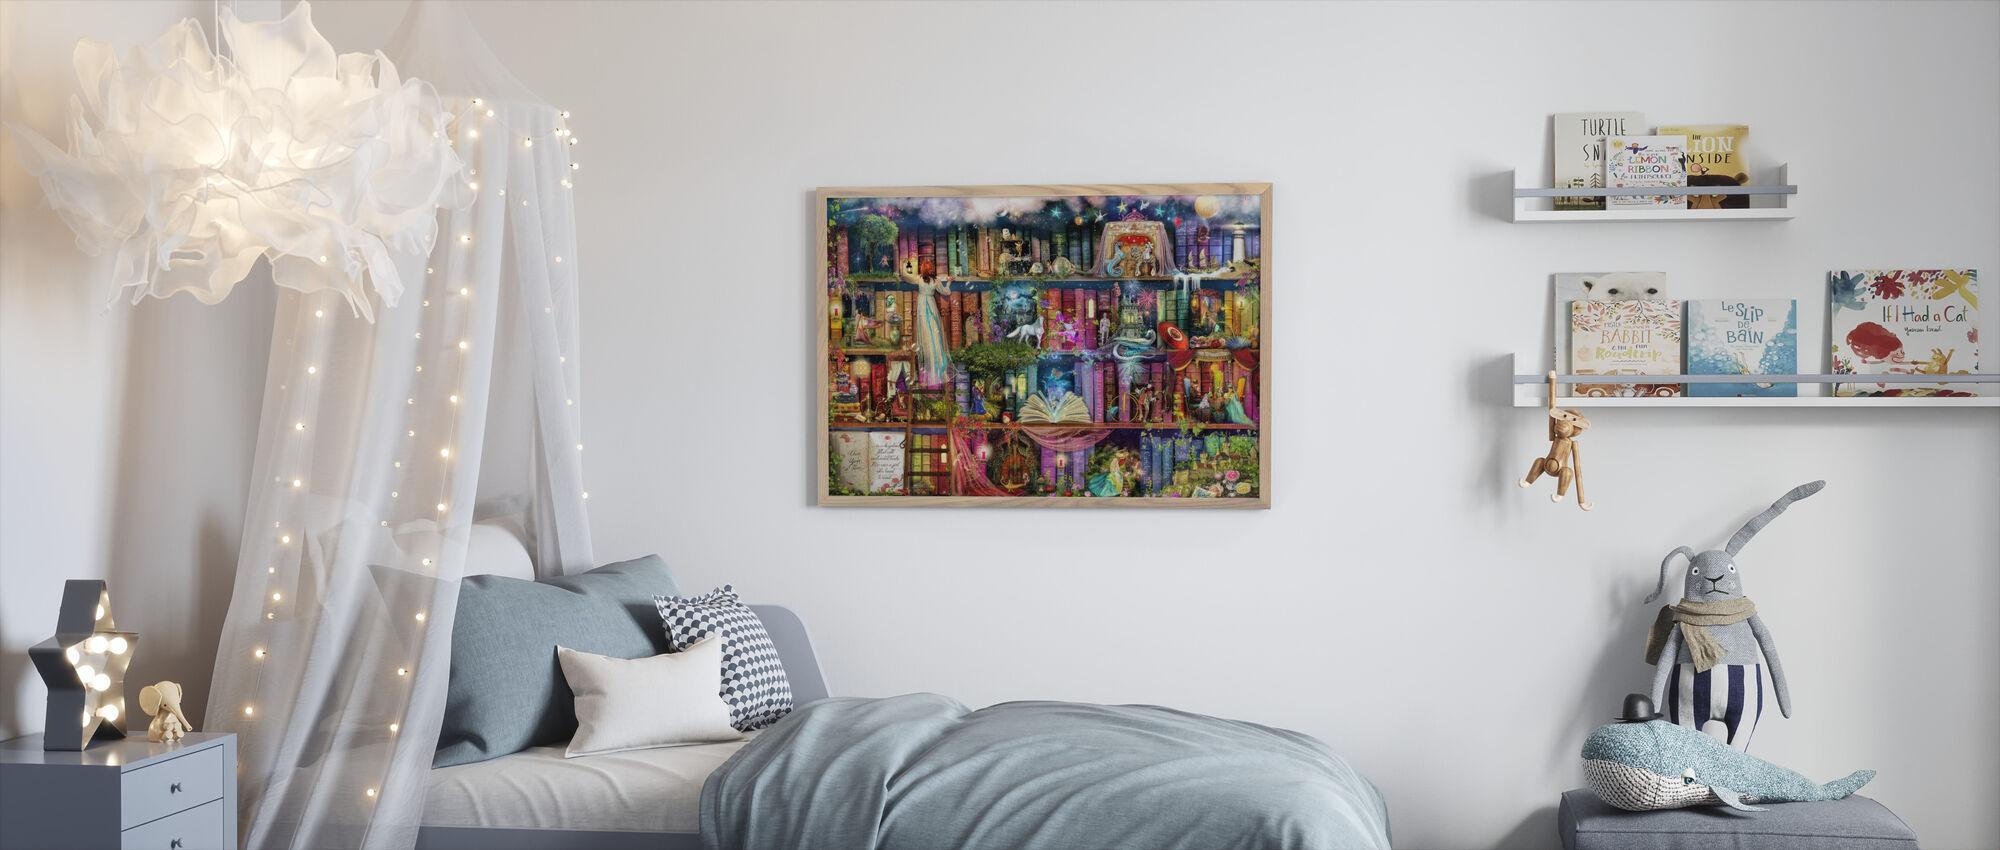 Treasure Hunt Book Shelf - Framed print - Kids Room